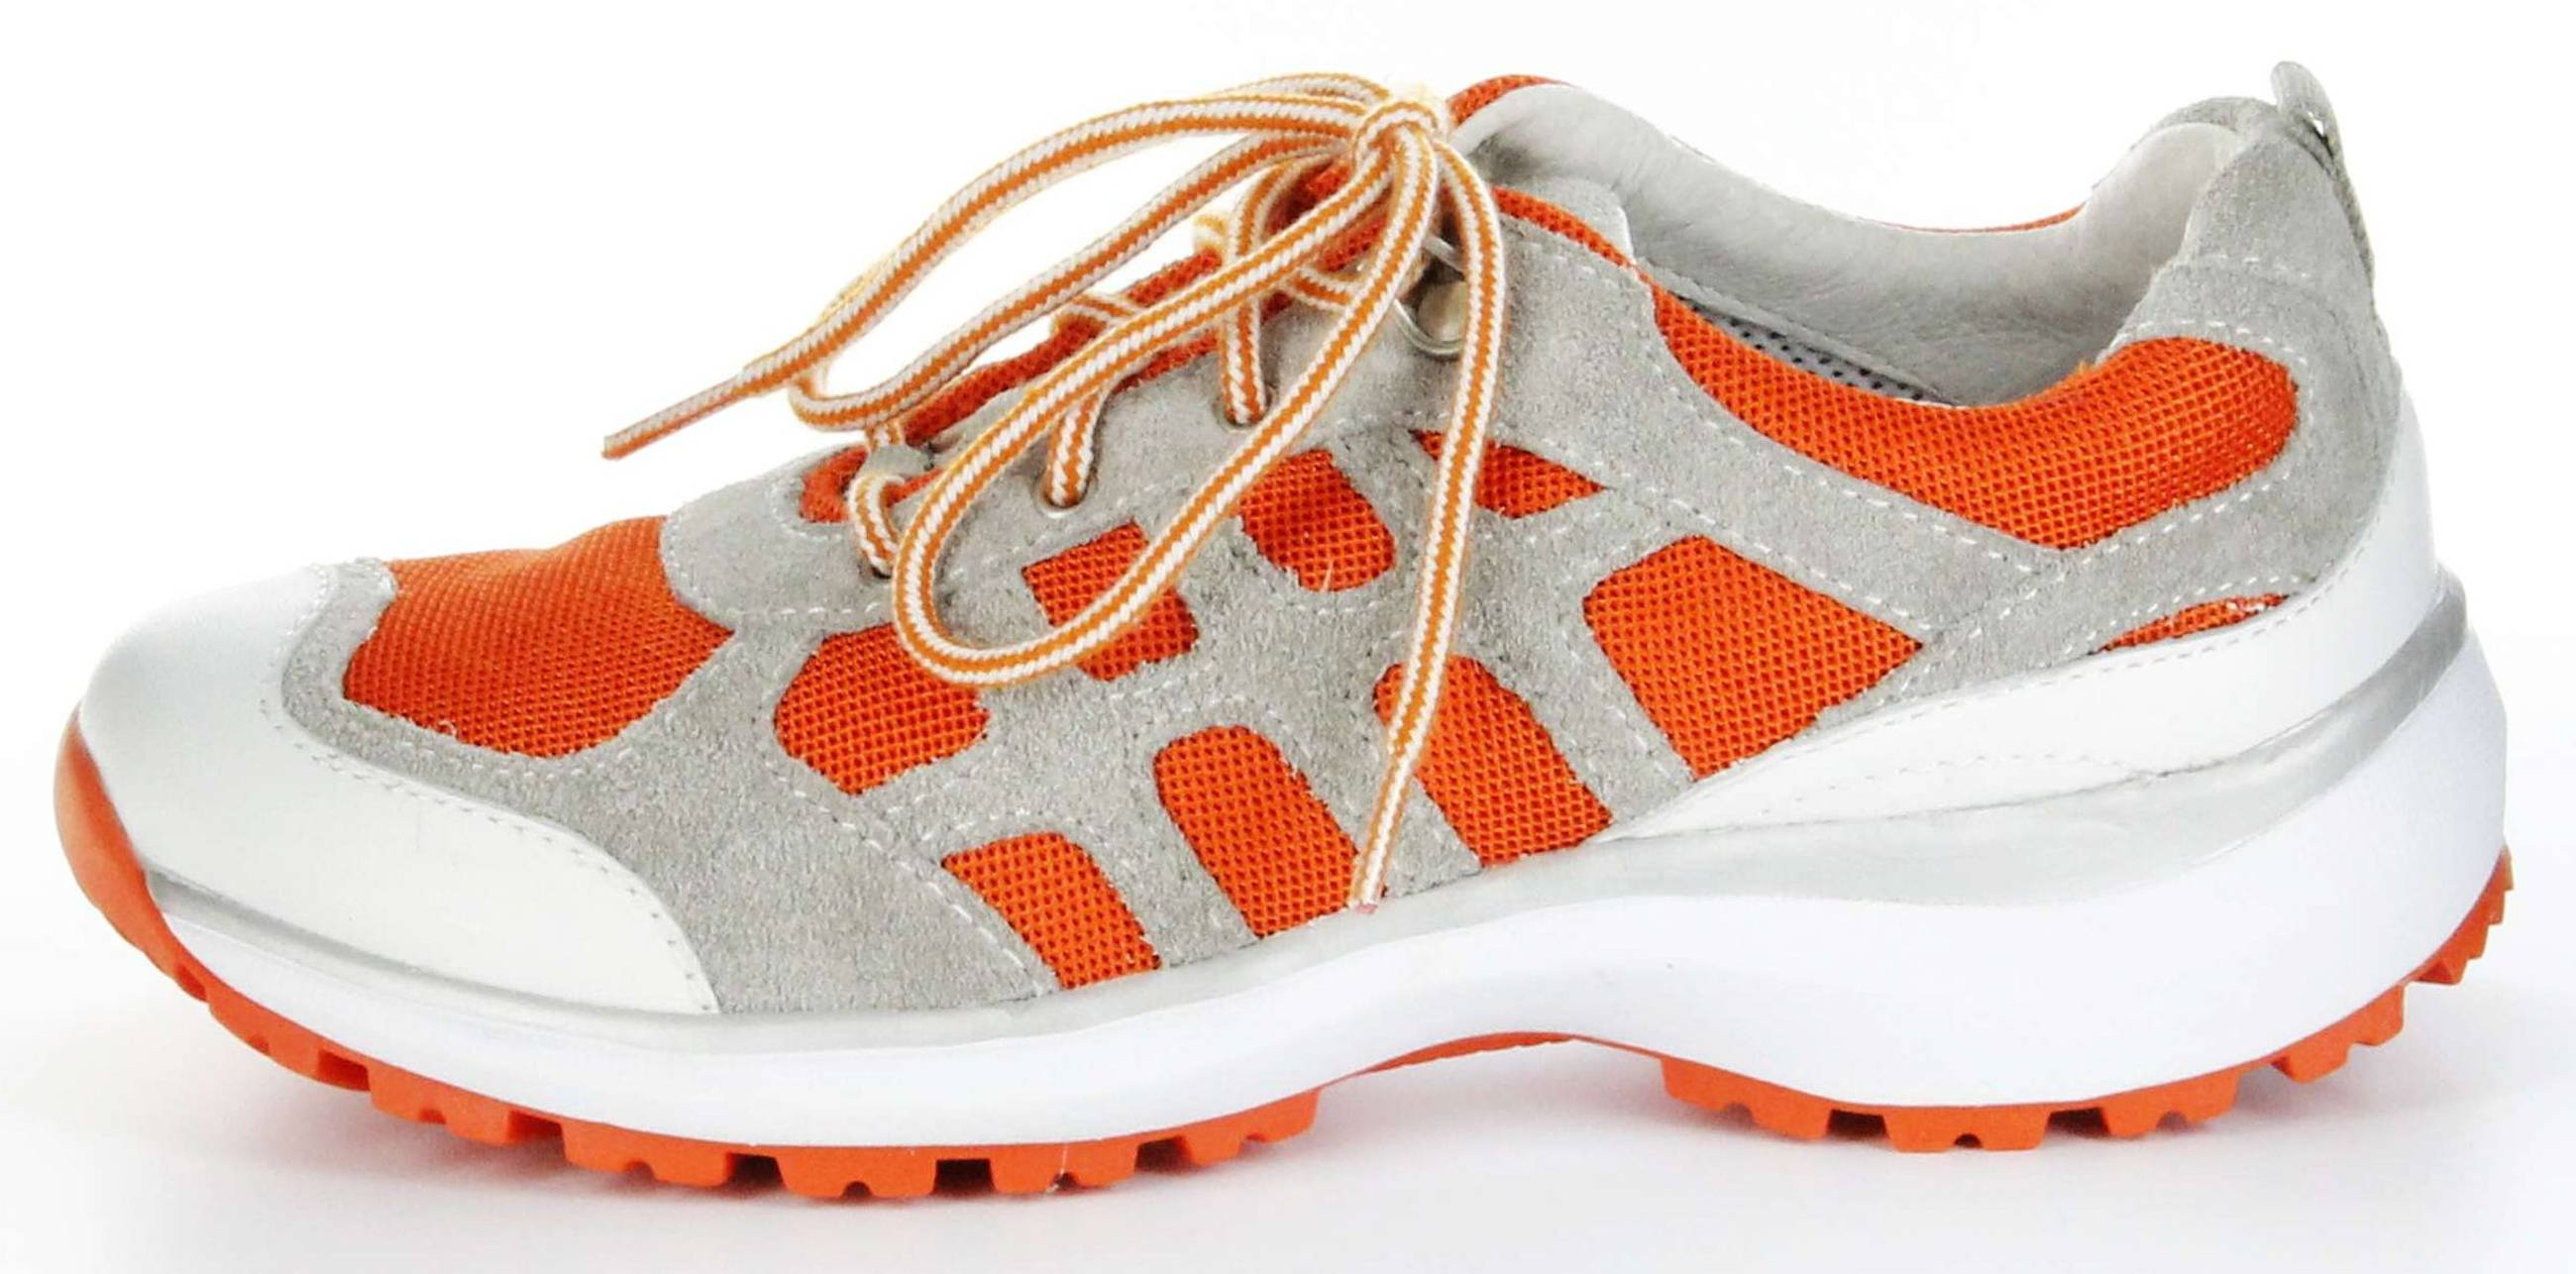 Josef Seibel Sportschuhe weißgrün Leicht Damen Outdoor Schuhe Gabriele 06